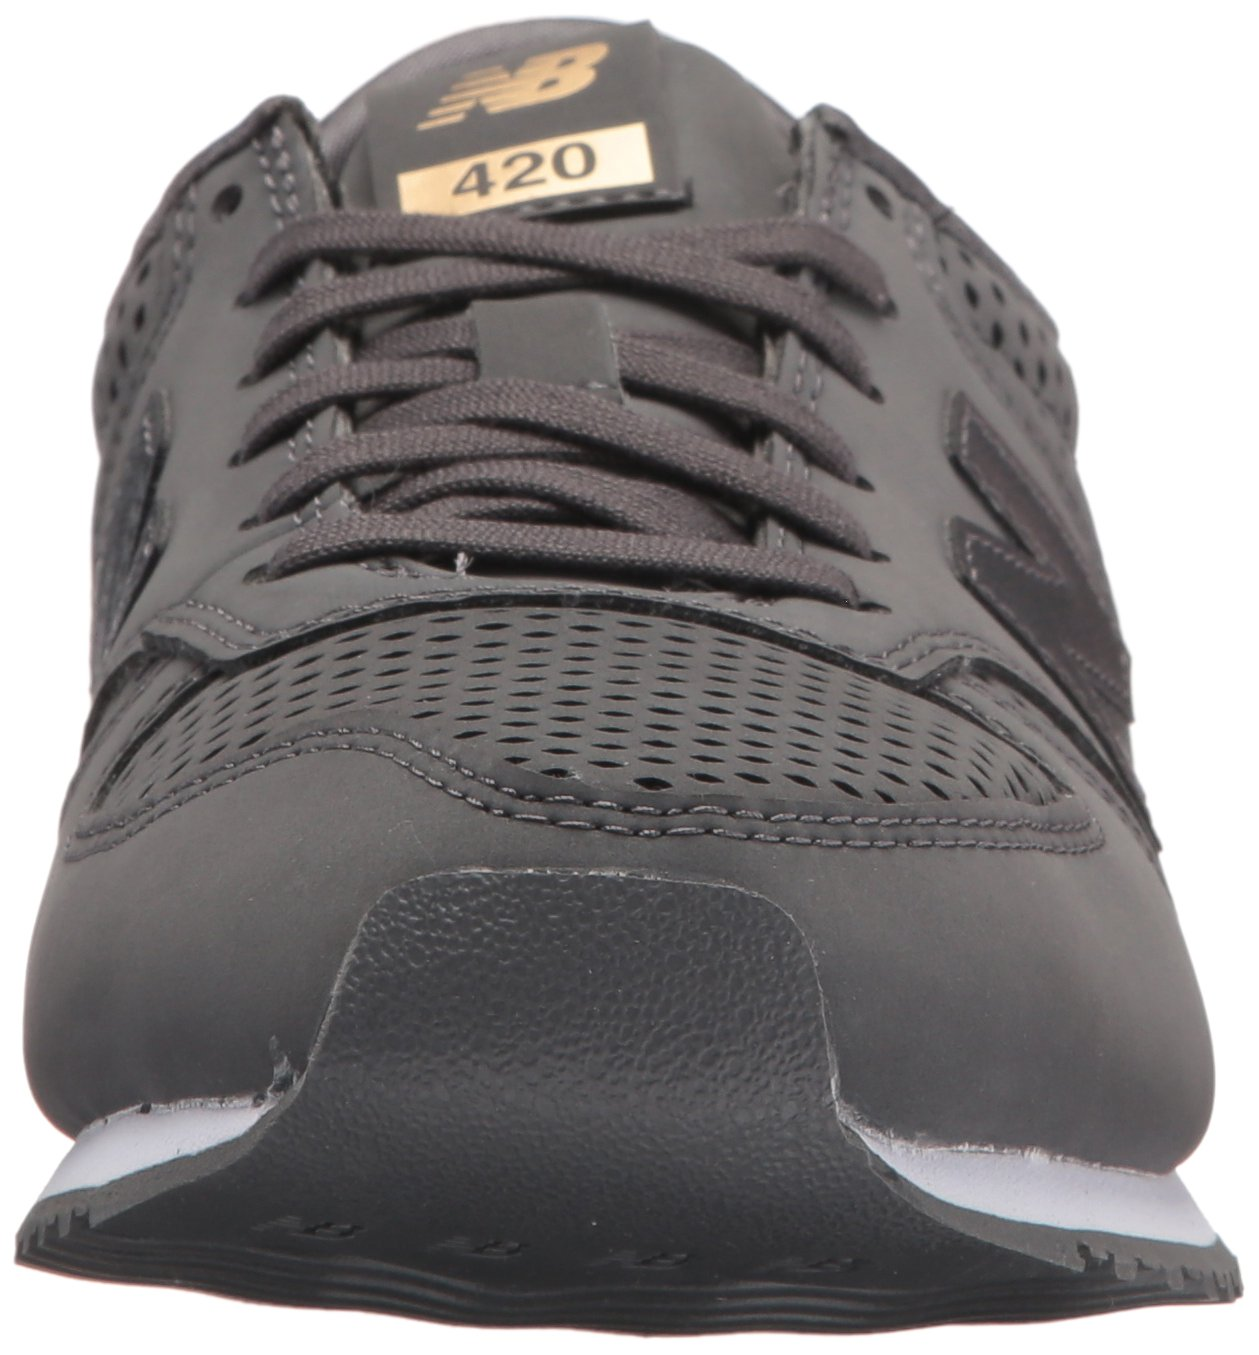 New Balance Women's 420v1 Lifestyle Sneaker B01N1W26QE 6 B(M) US Magnet/Copper Metallic